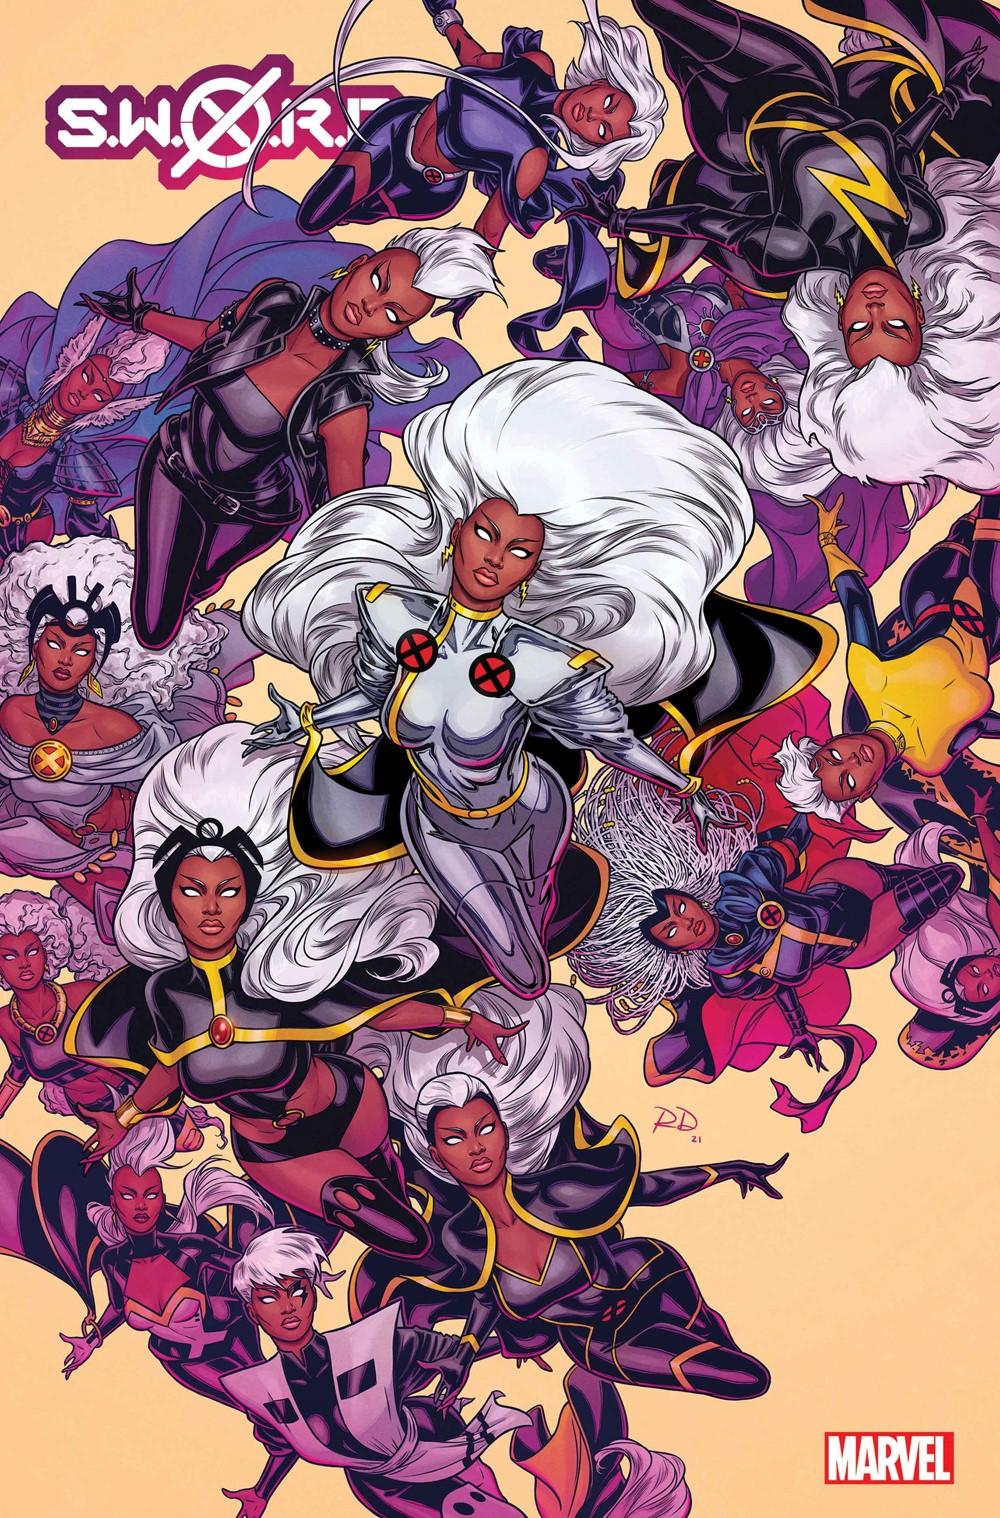 SWORD2020008_Dauterman_var Marvel Comics September 2021 Solicitations